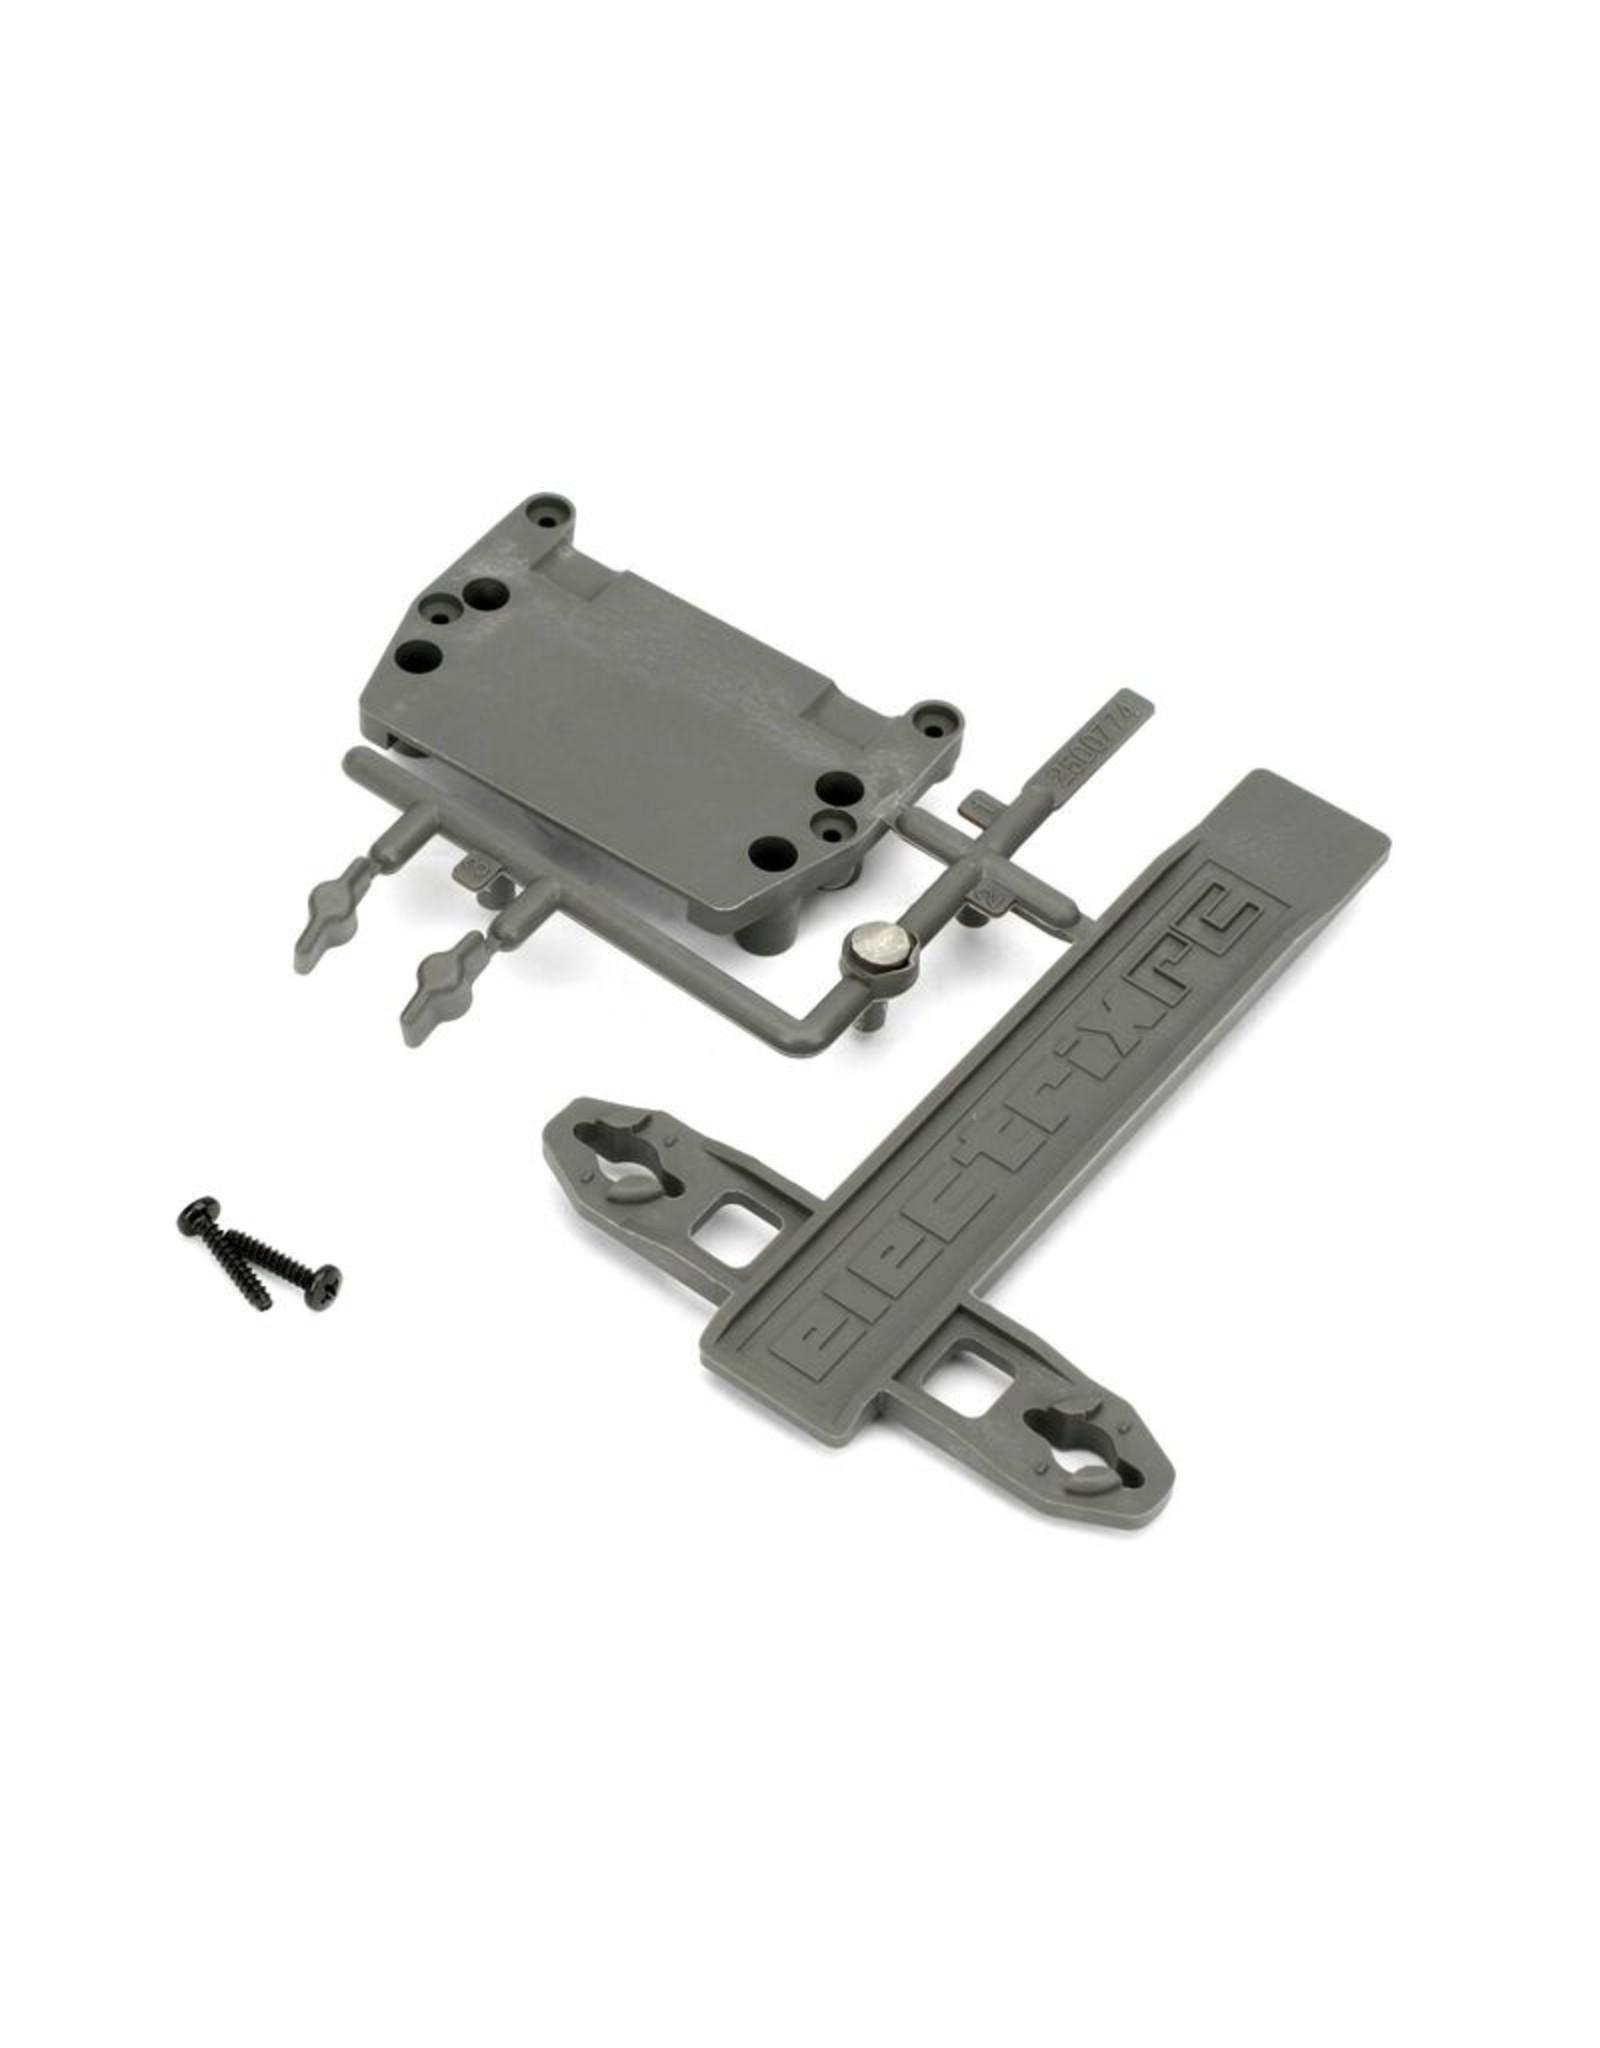 ECX 1088 - Battery Strap, ESC Plate: 1/10 2WD Circuit, Boost